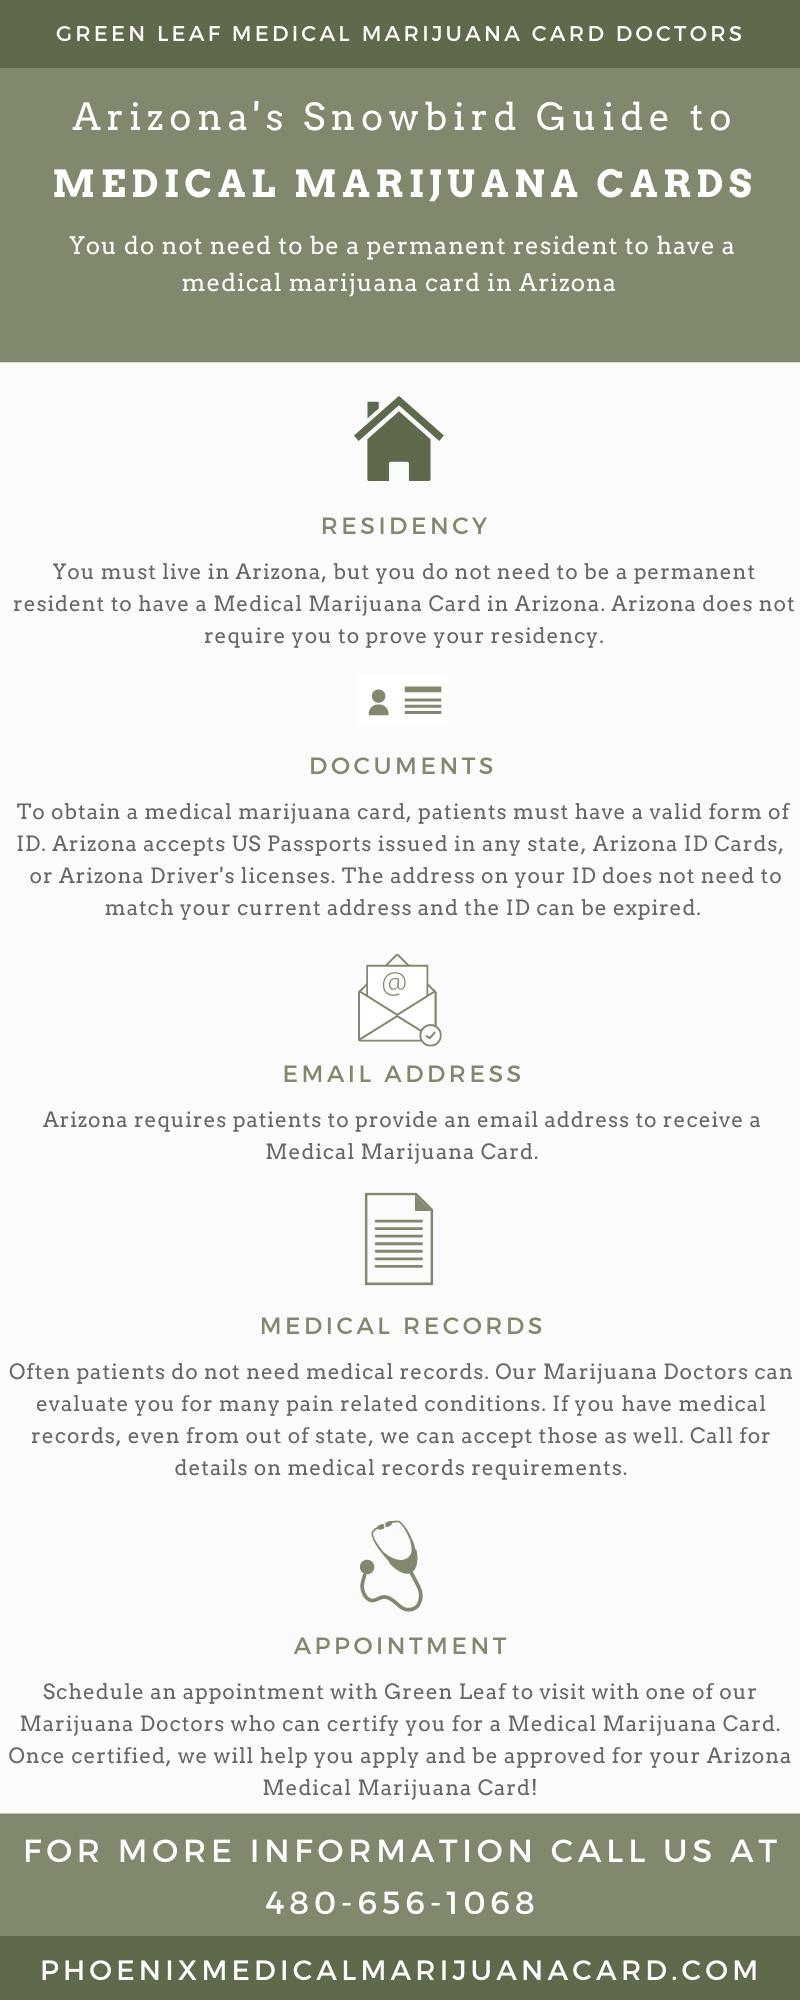 How can snowbirds get a medical marijuana card in Arzona